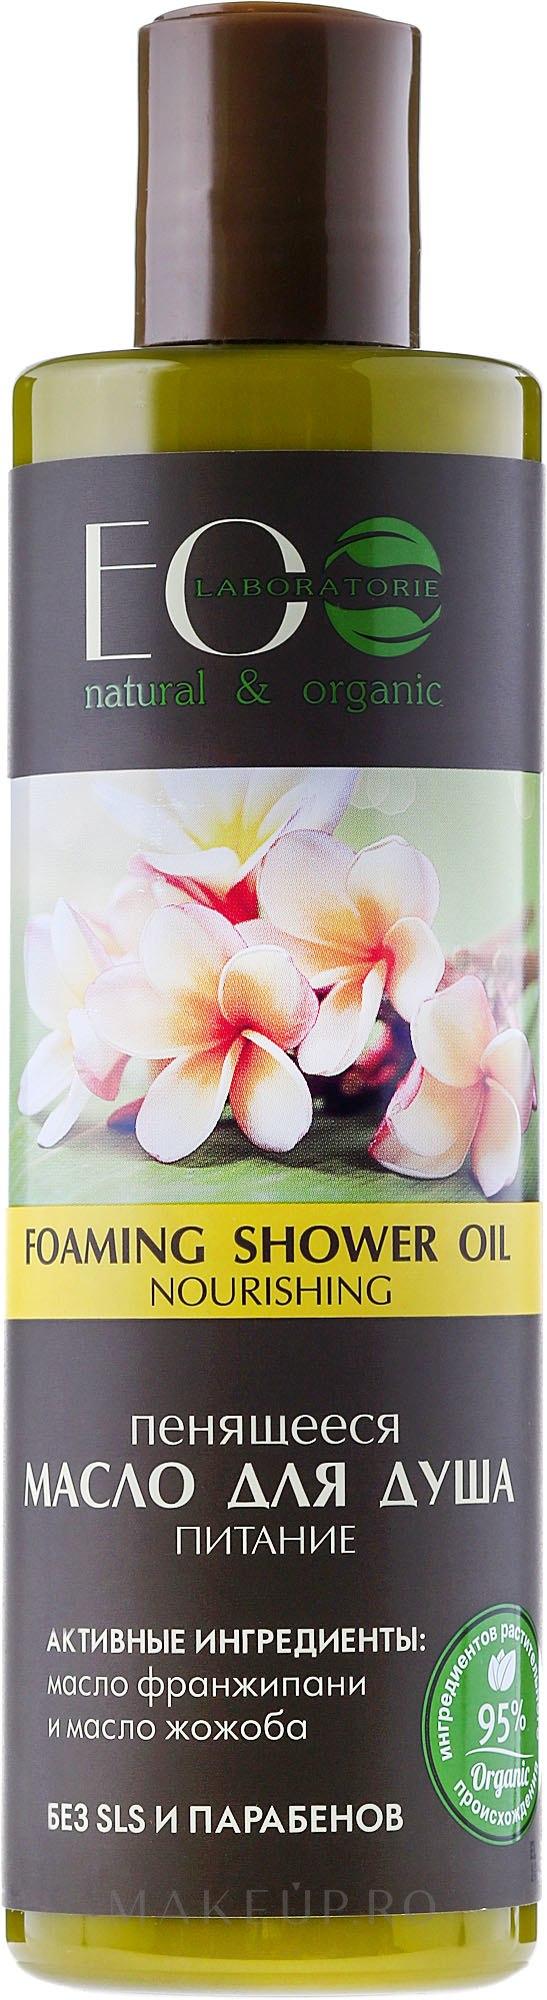 "Ulei spumant pentru duș ""Nutritiv"" - ECO Laboratorie Foaming Shower Oil Nourishing — Imagine 250 ml"